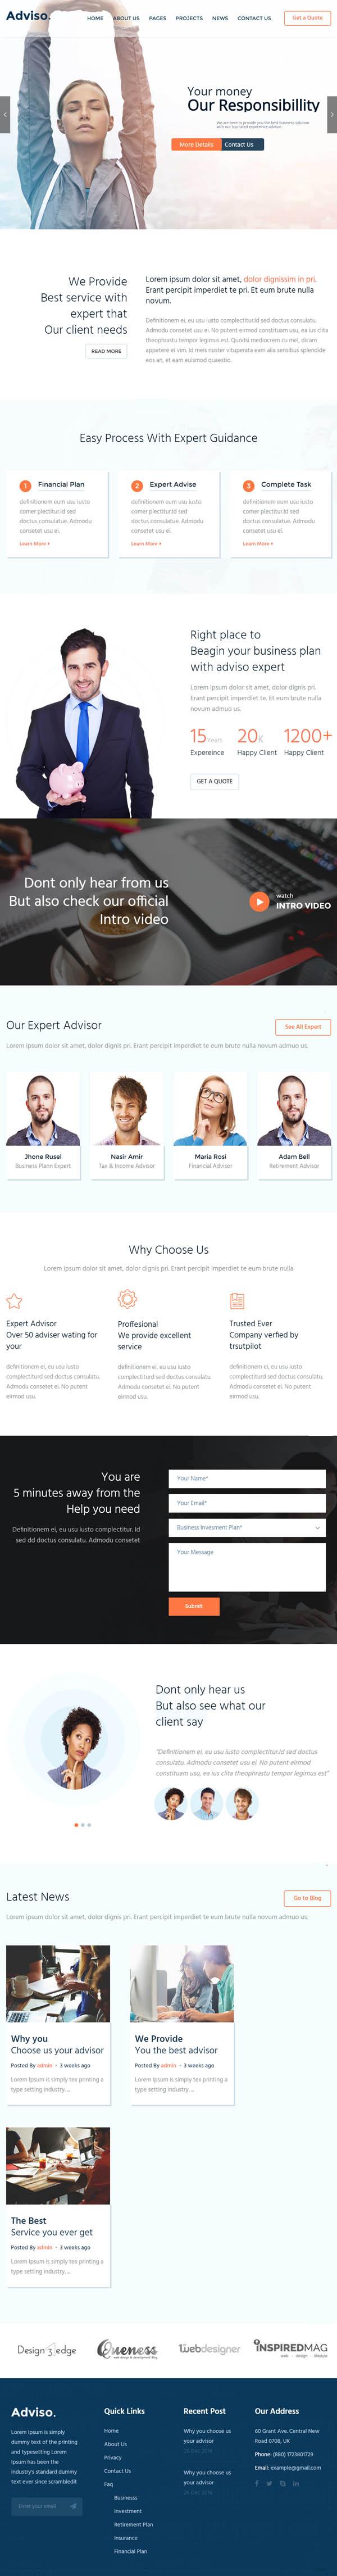 Adviso – Finance, Consulting, Business WordPress Theme